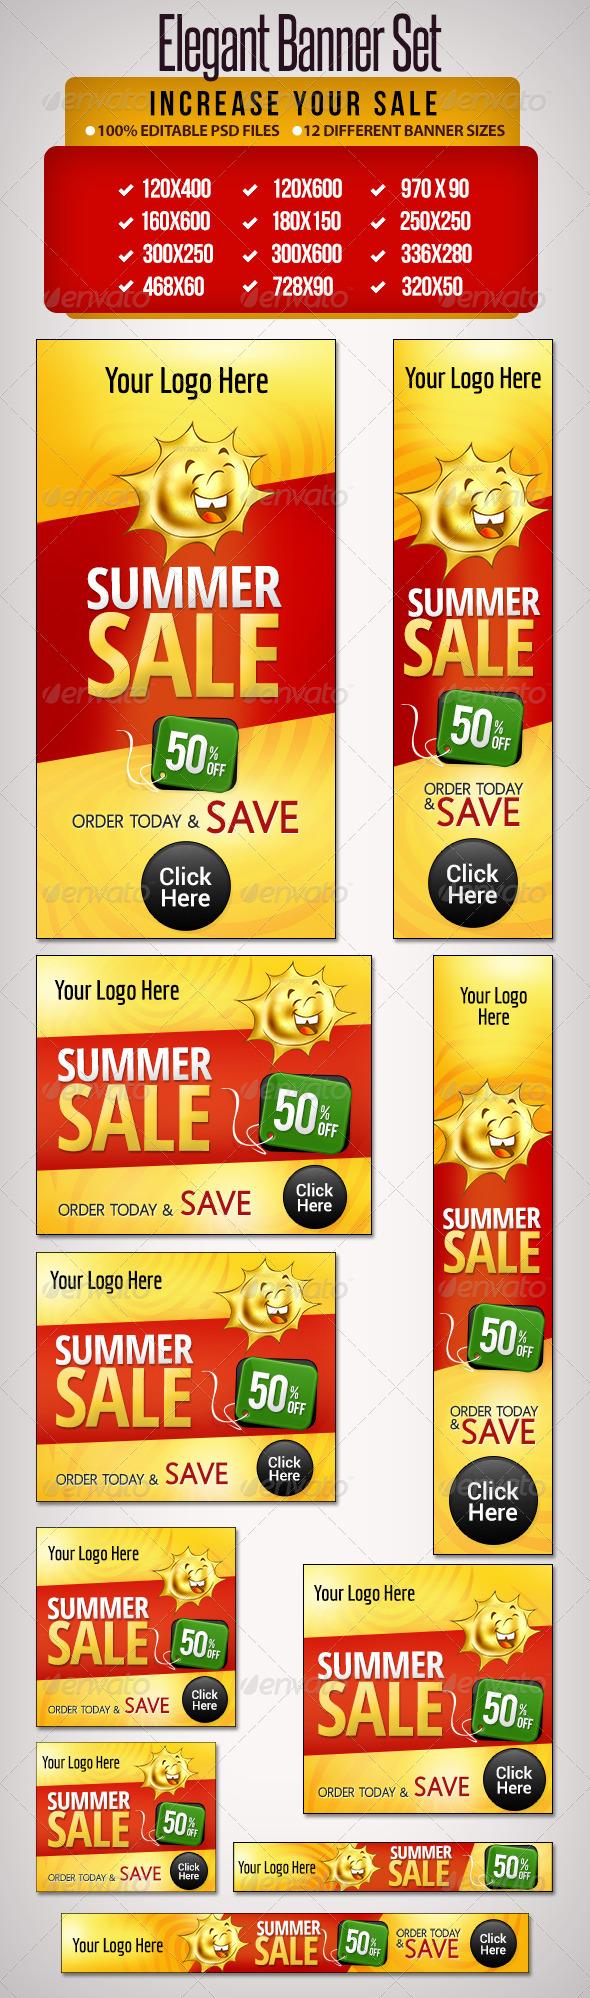 GraphicRiver Summer Banner Set All standard sizes 5133944